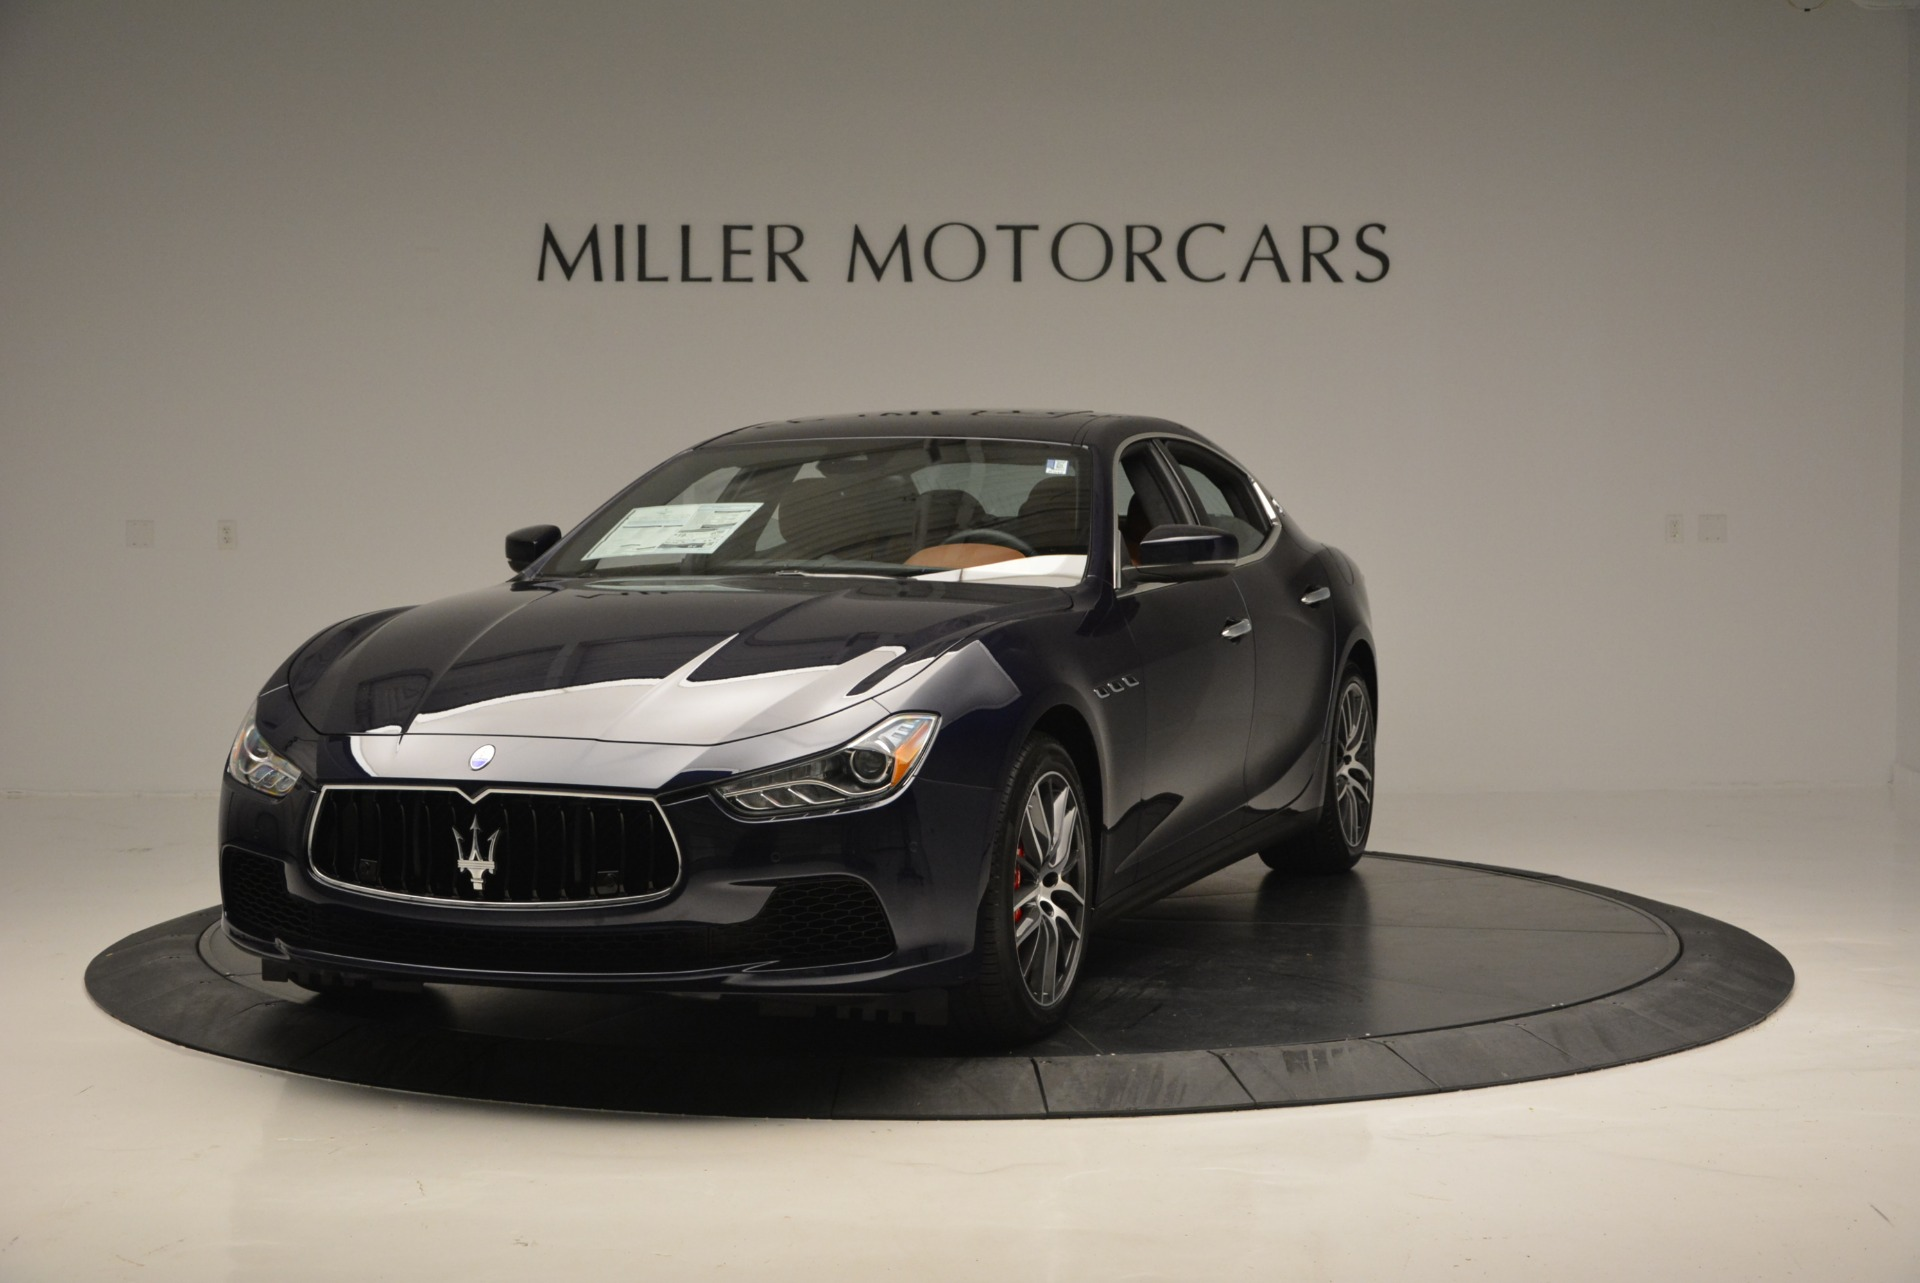 New 2017 Maserati Ghibli S Q4 For Sale In Westport, CT 580_main